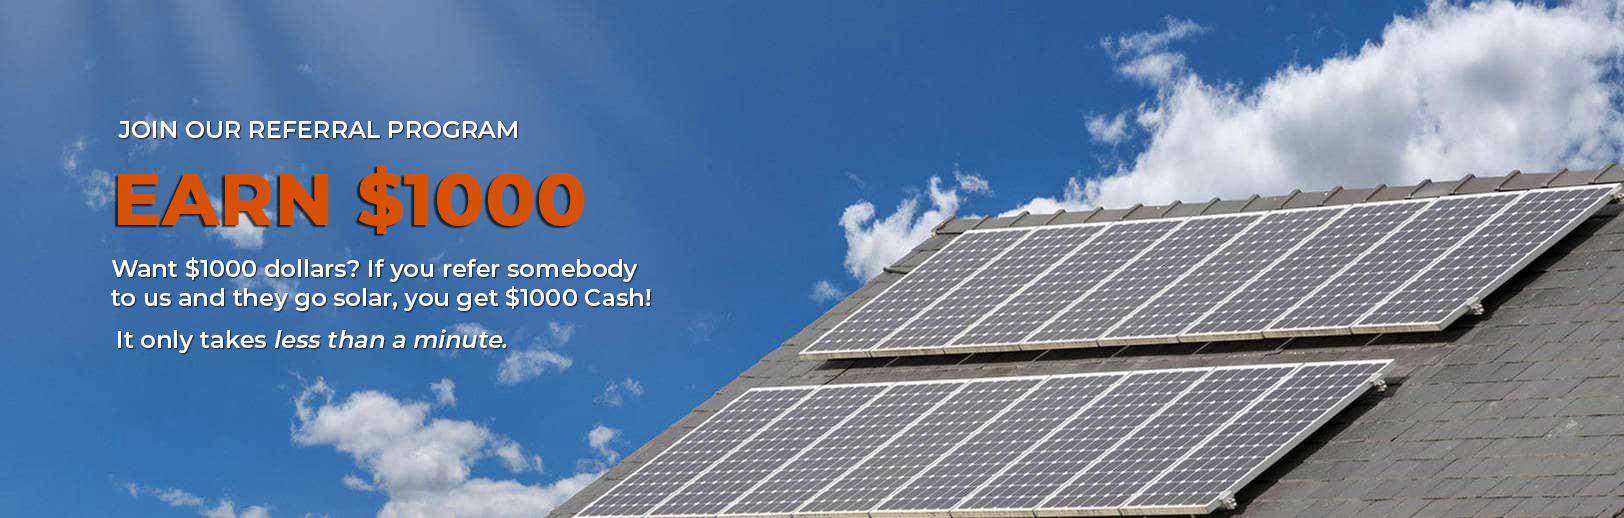 solar-referral-program